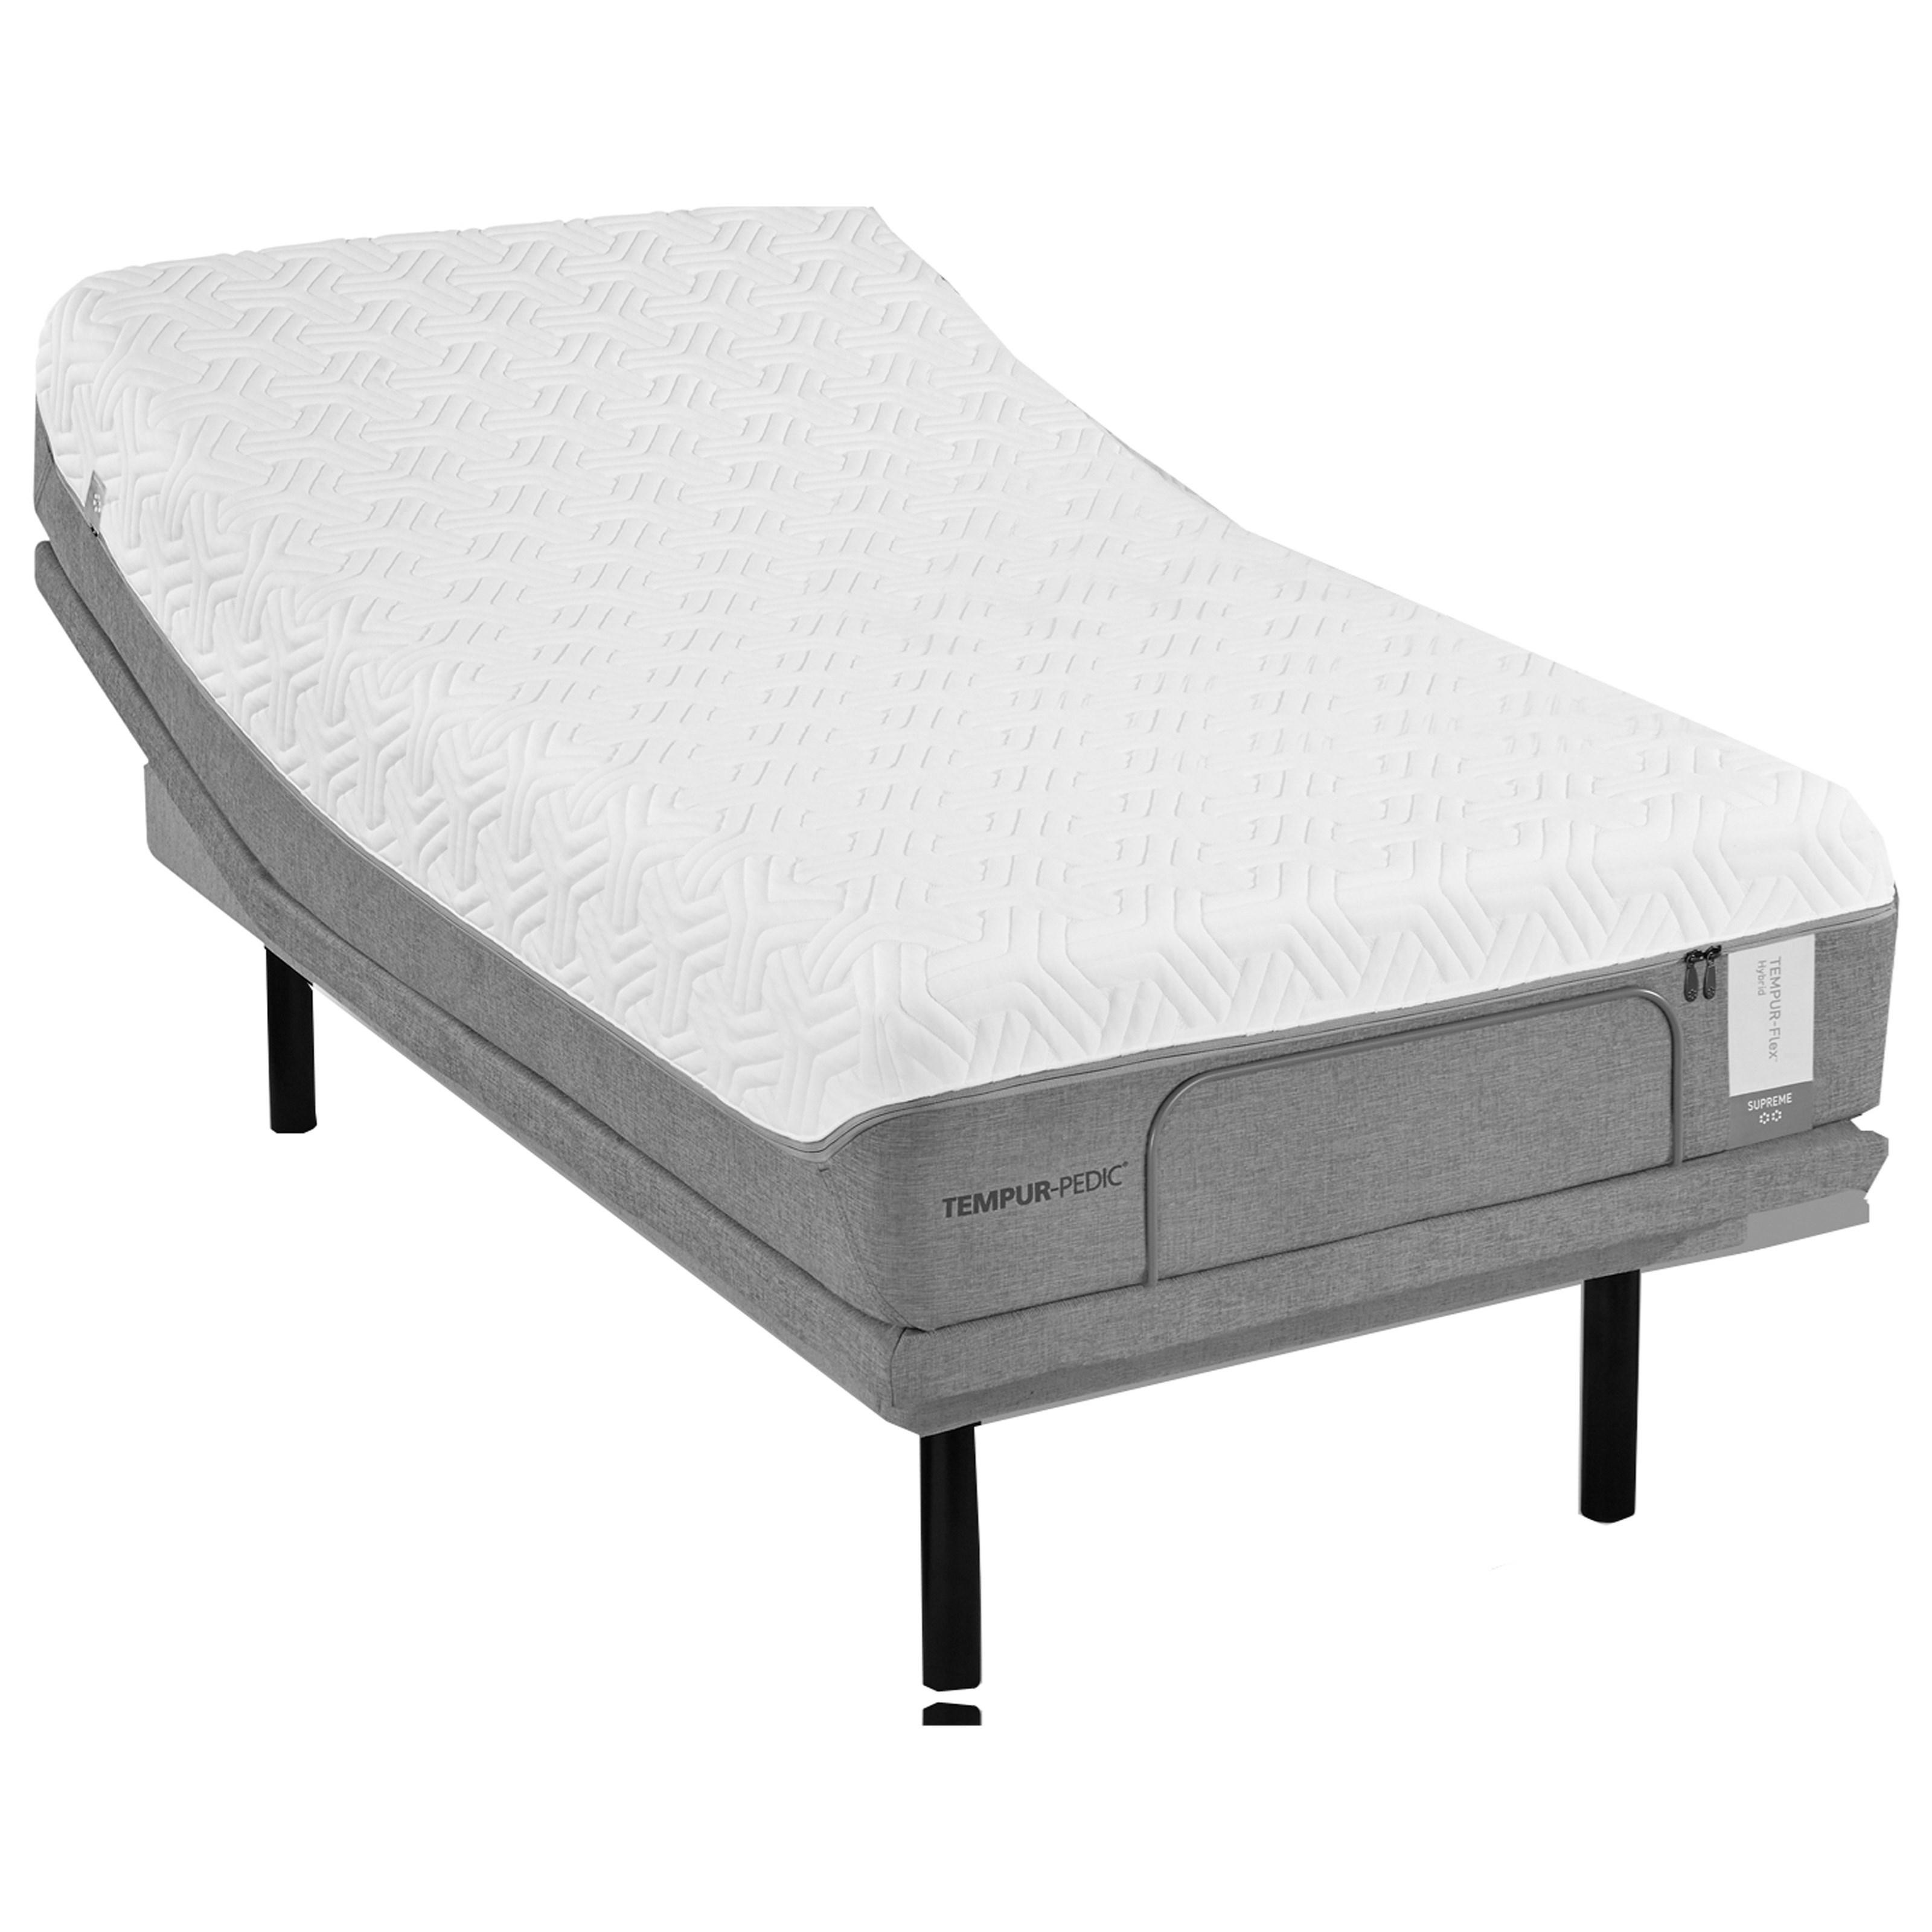 Tempur-Pedic® TEMPUR-Flex Elite Cal King Medium Soft Plush Mattress Set - Item Number: 10117180+2x25289290